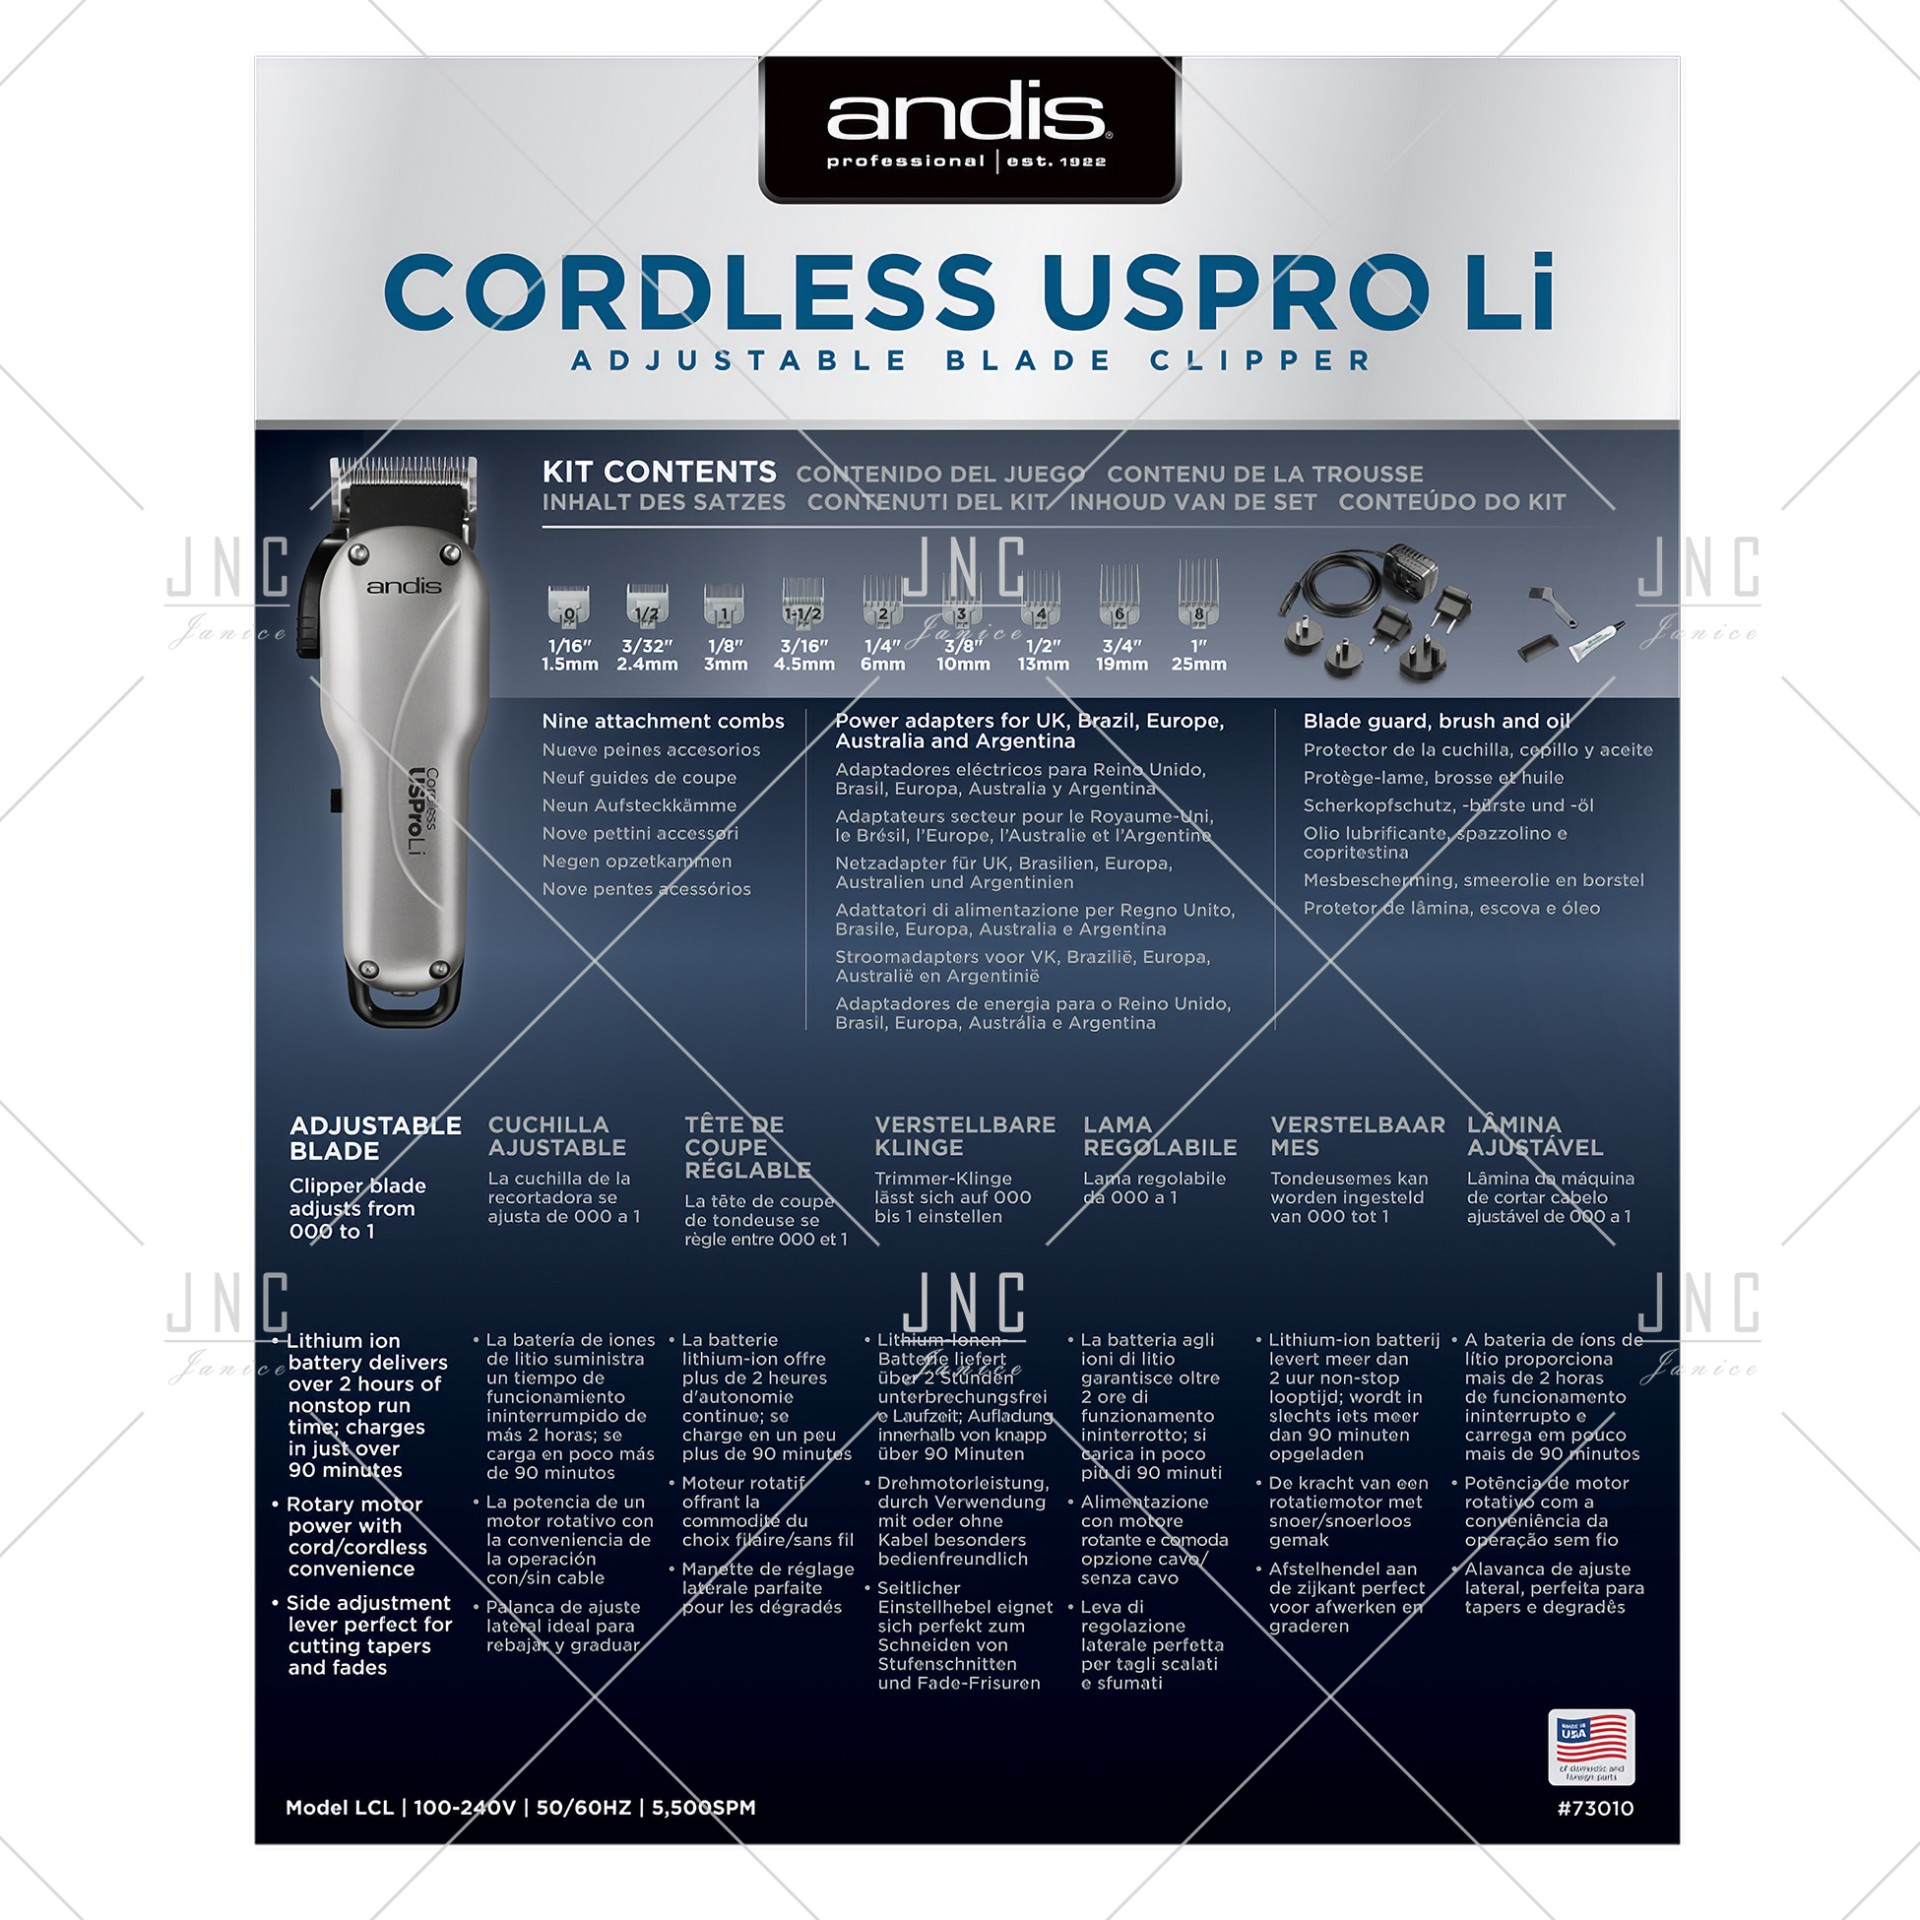 Máquina Andis Cordless USPro Li Adjustable Blade Clipper | REF.A73010